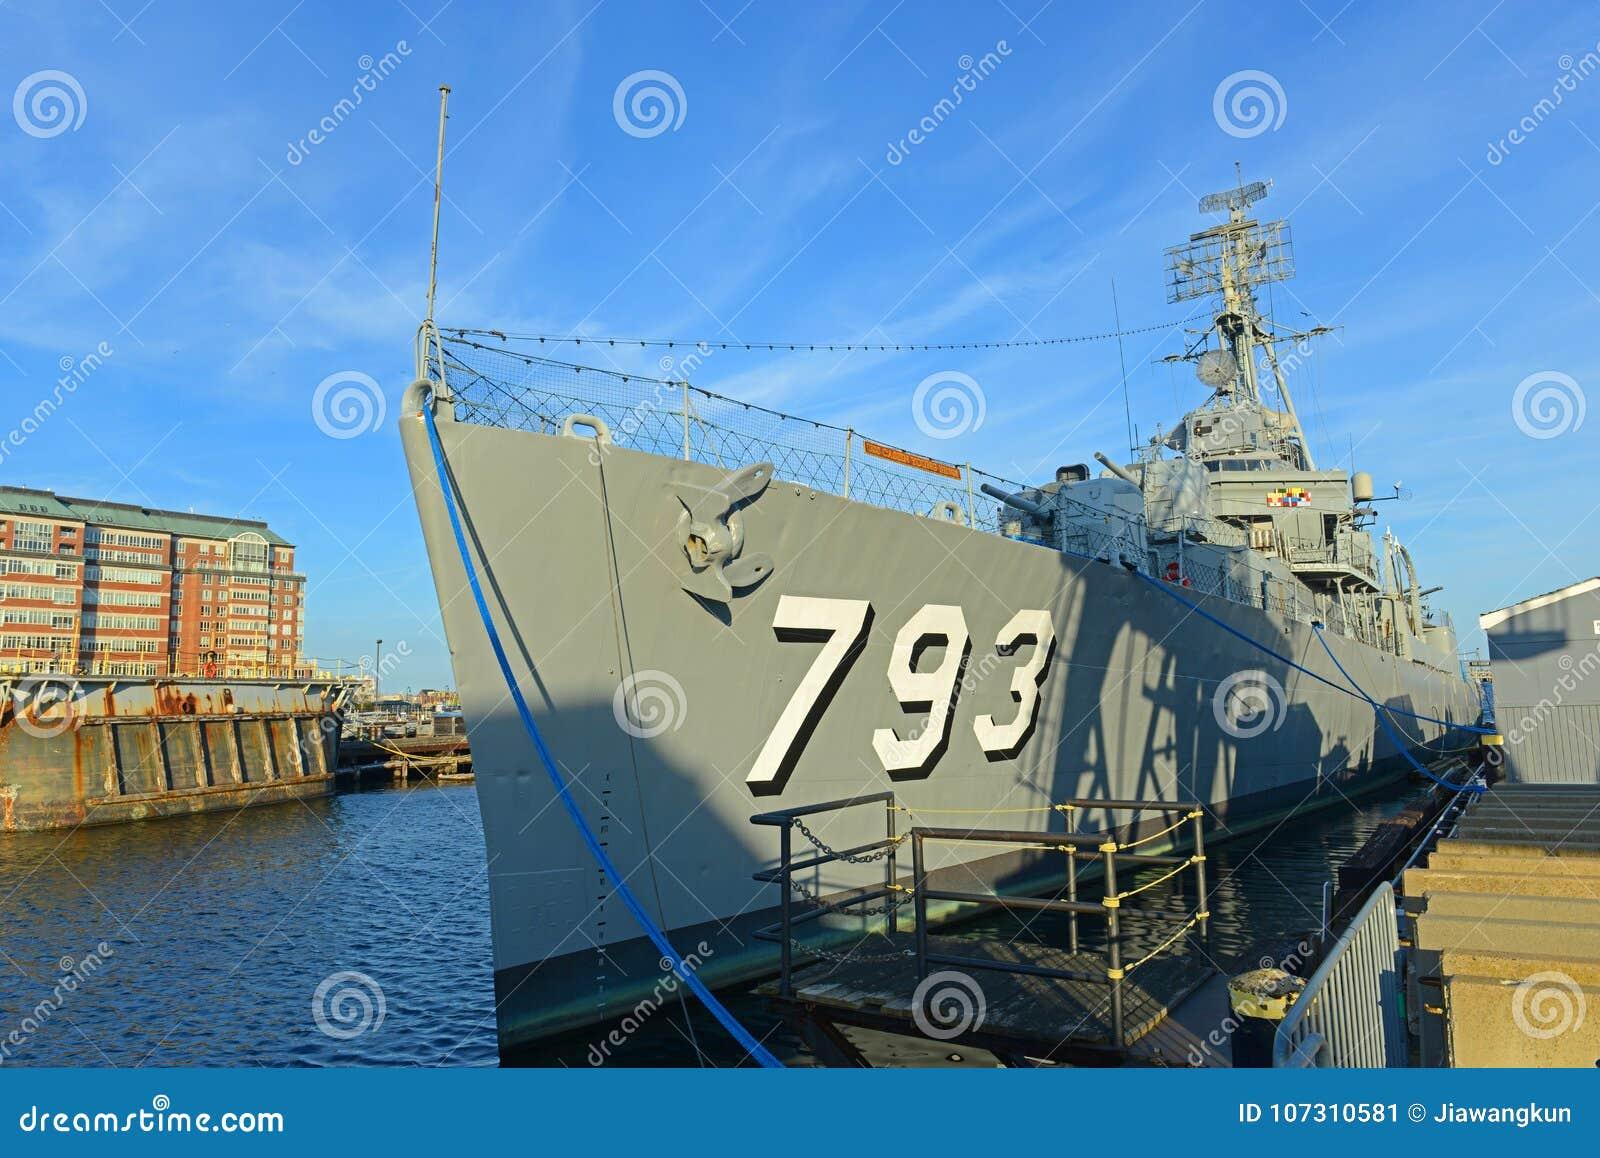 USS Cassin jeune DD-793 à Boston, le Massachusetts, Etats-Unis